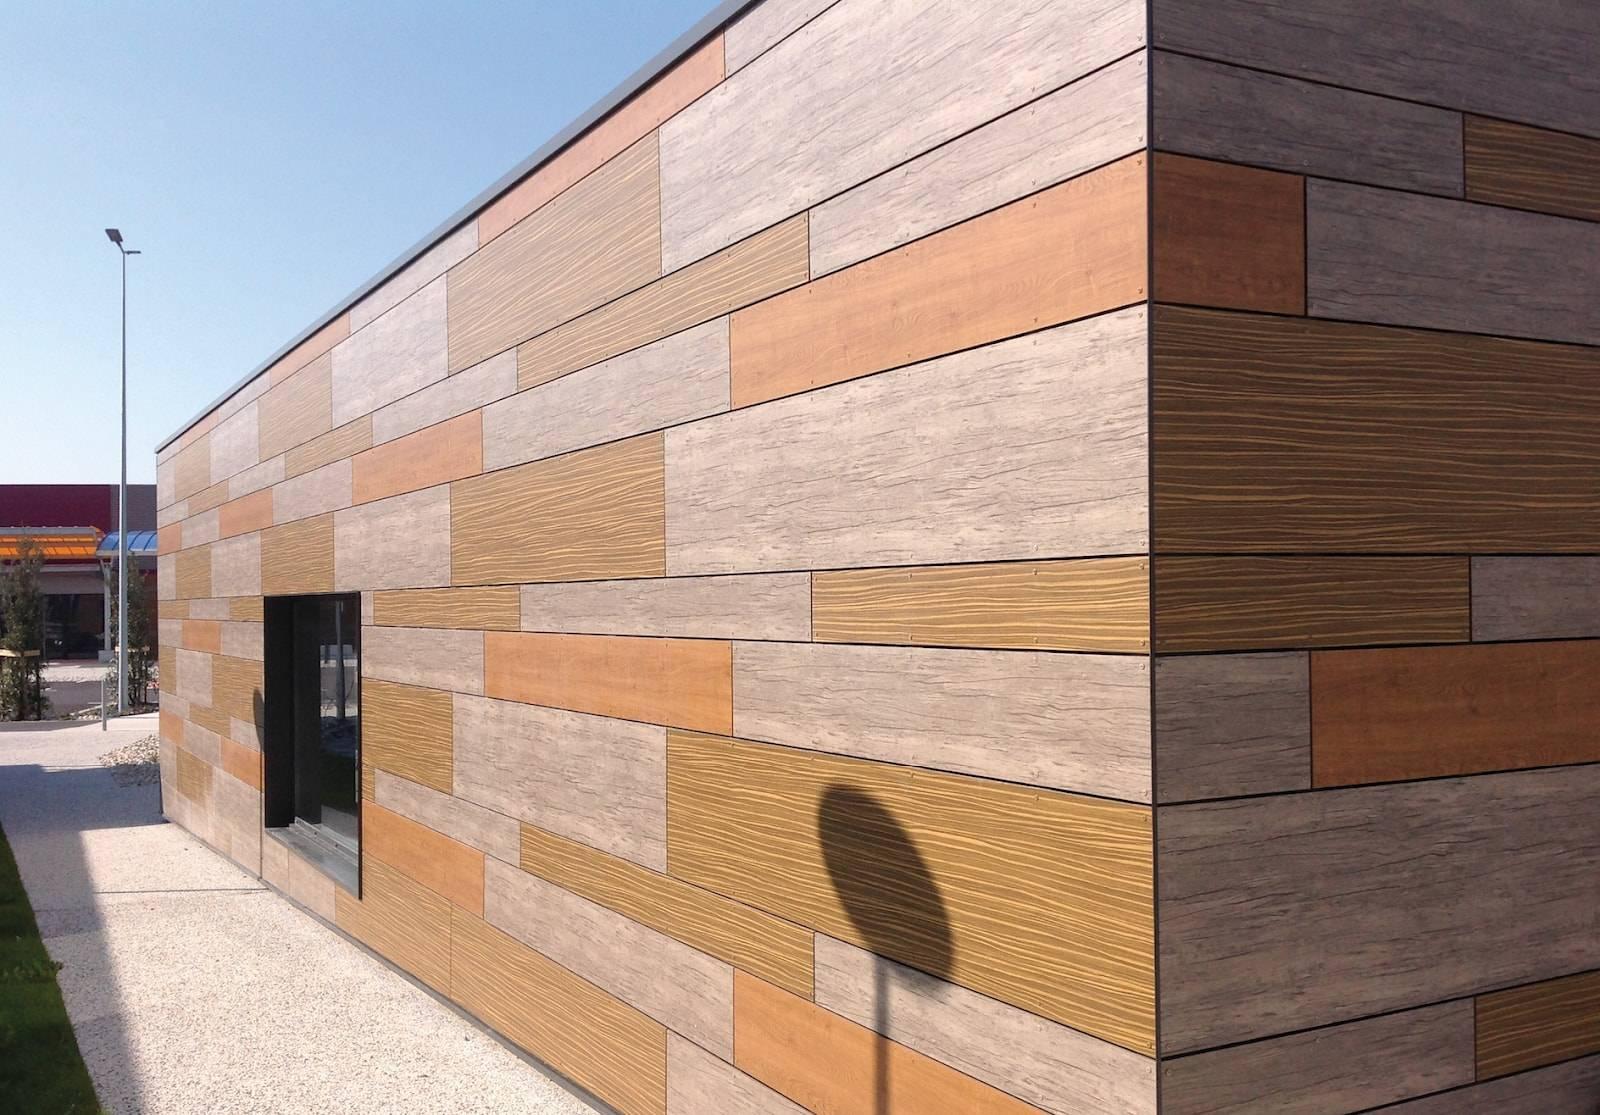 10 видов материалов для отделки фасада частного дома +100 фото